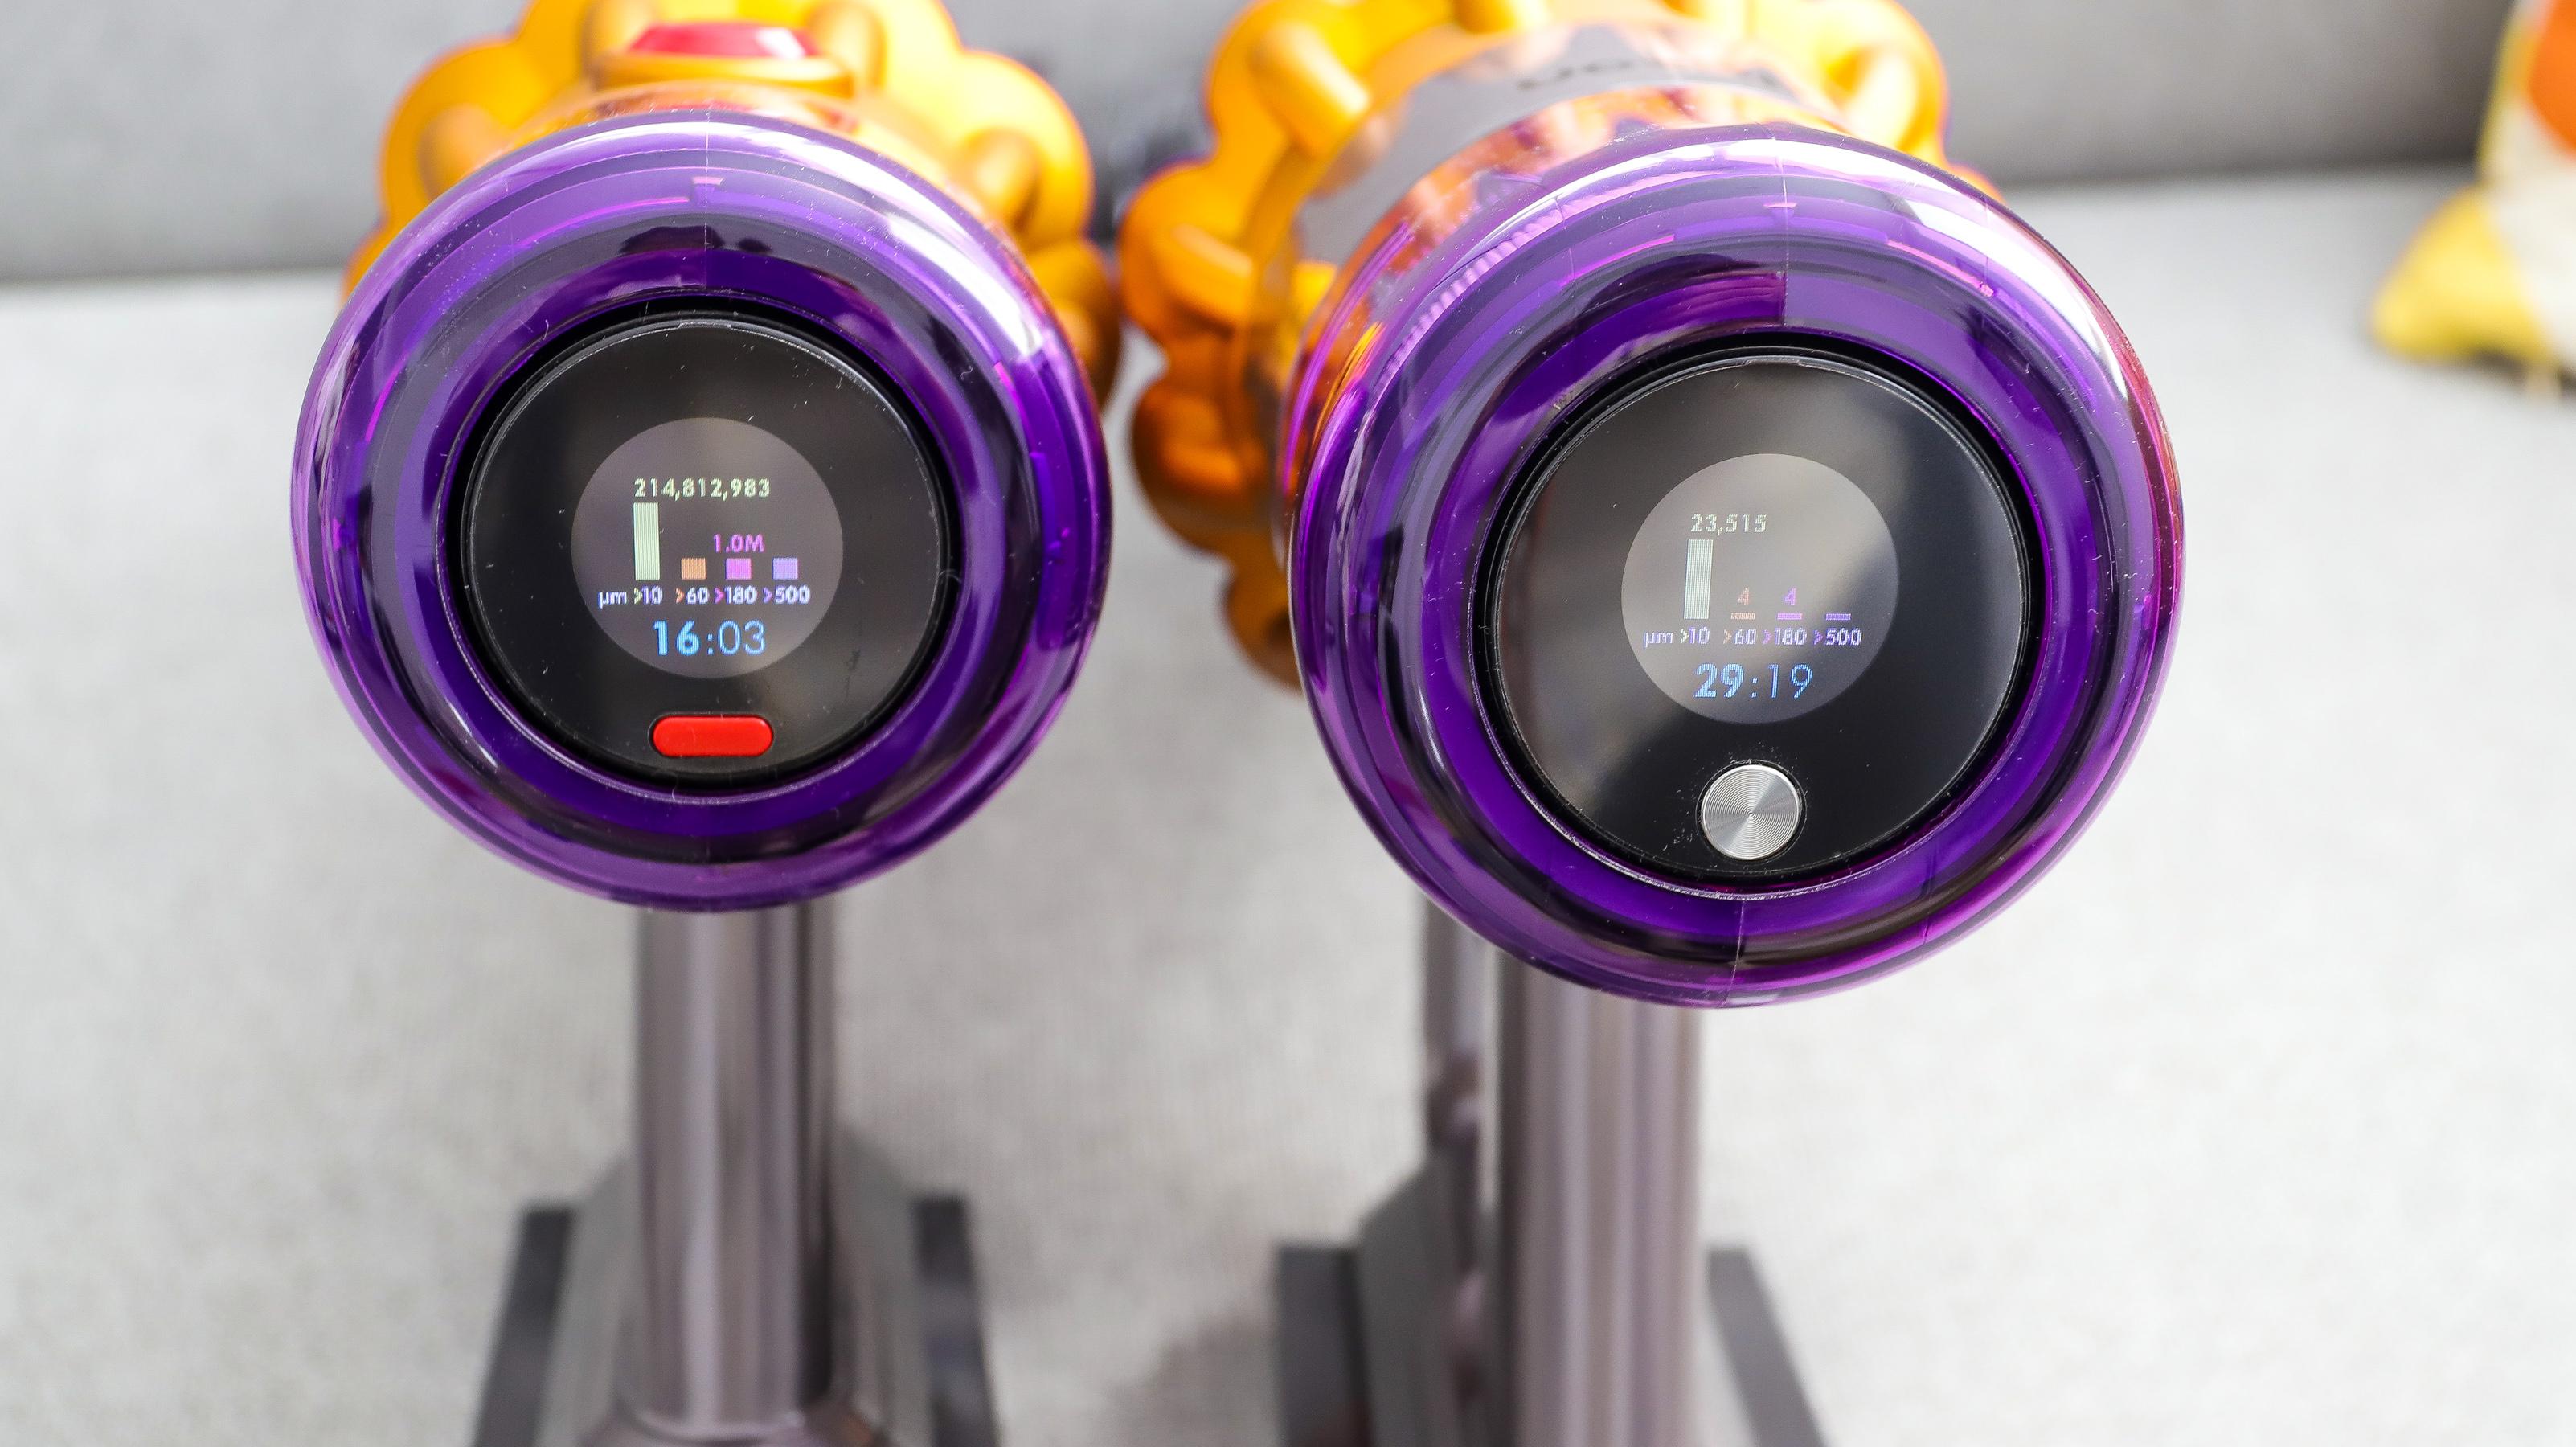 Dyson V12 Detect Slim and Dyson V15 Detect digital displays side by side